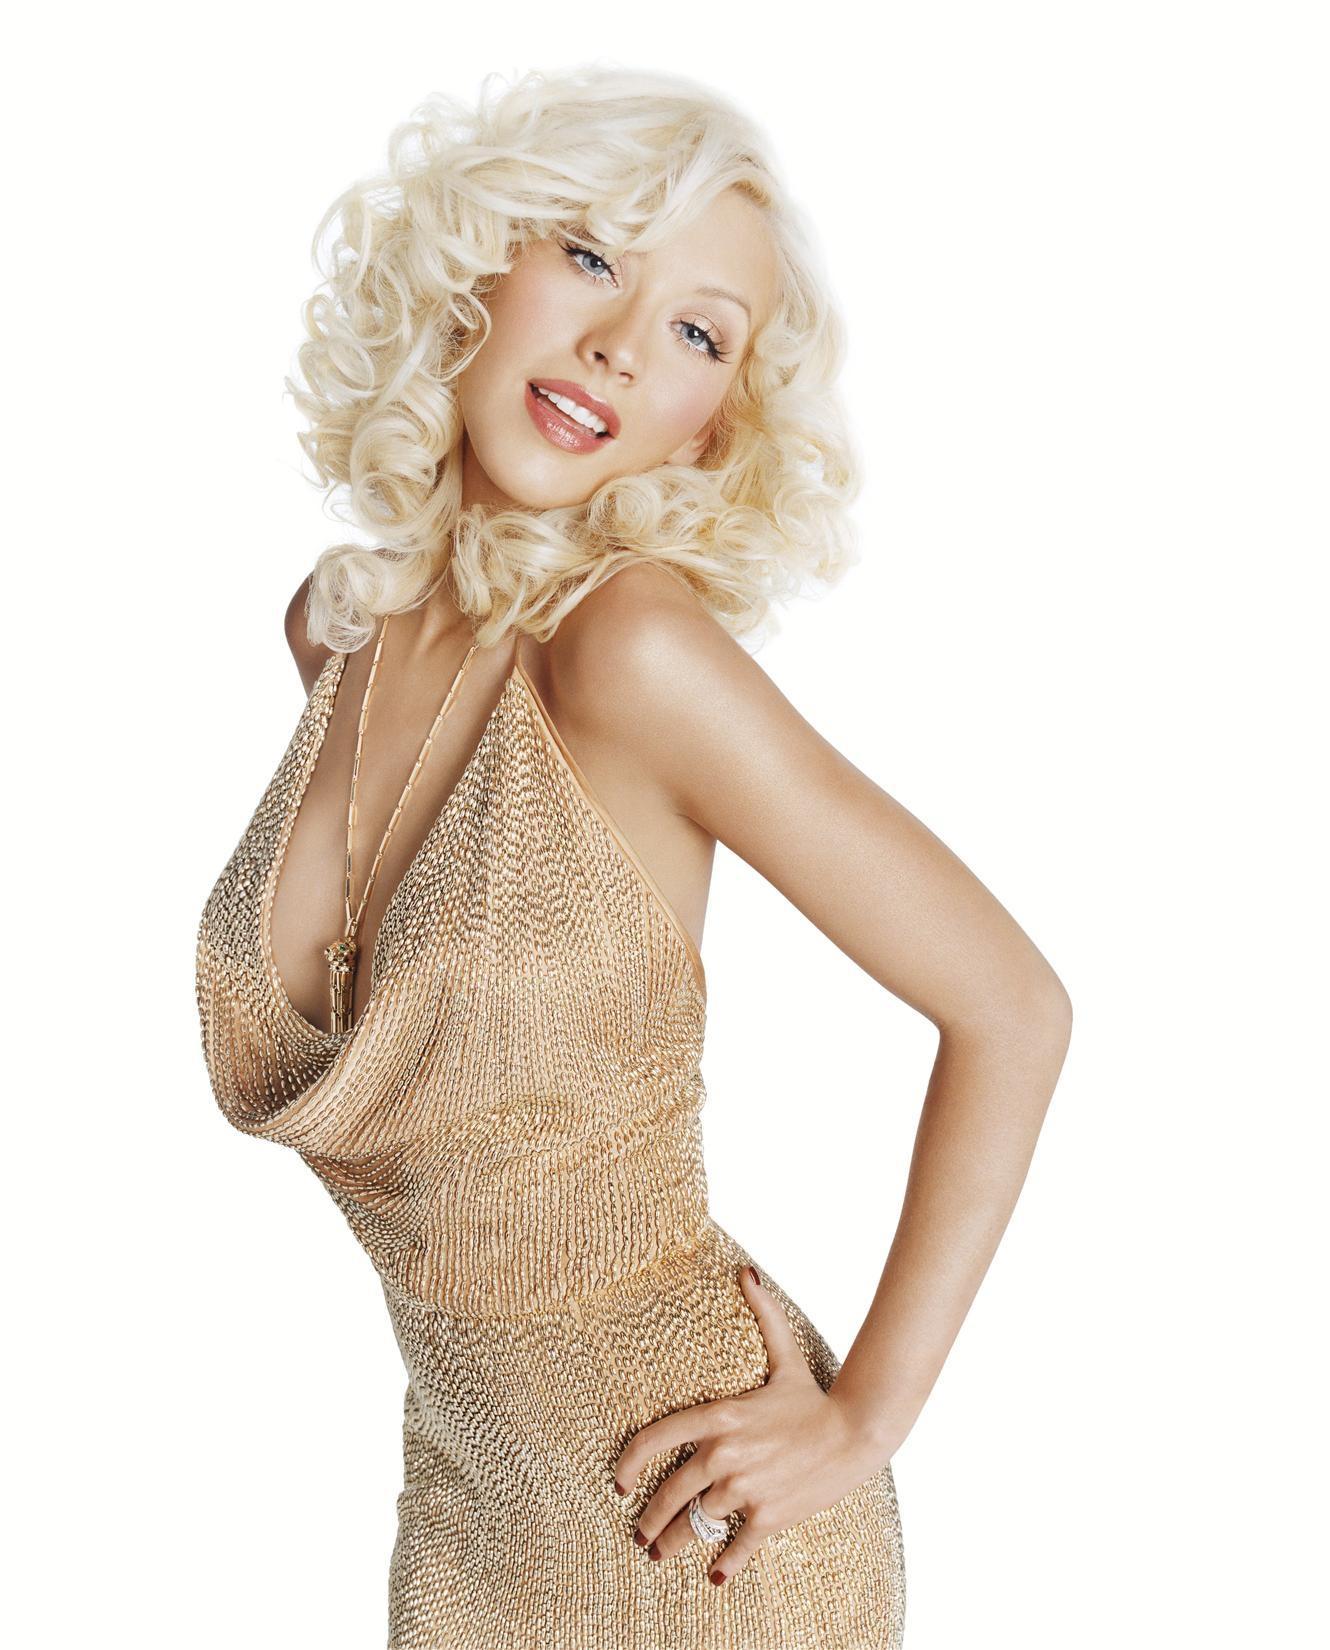 Кристина Агилера, фото 4444. Christina Aguilera, Carter Smith